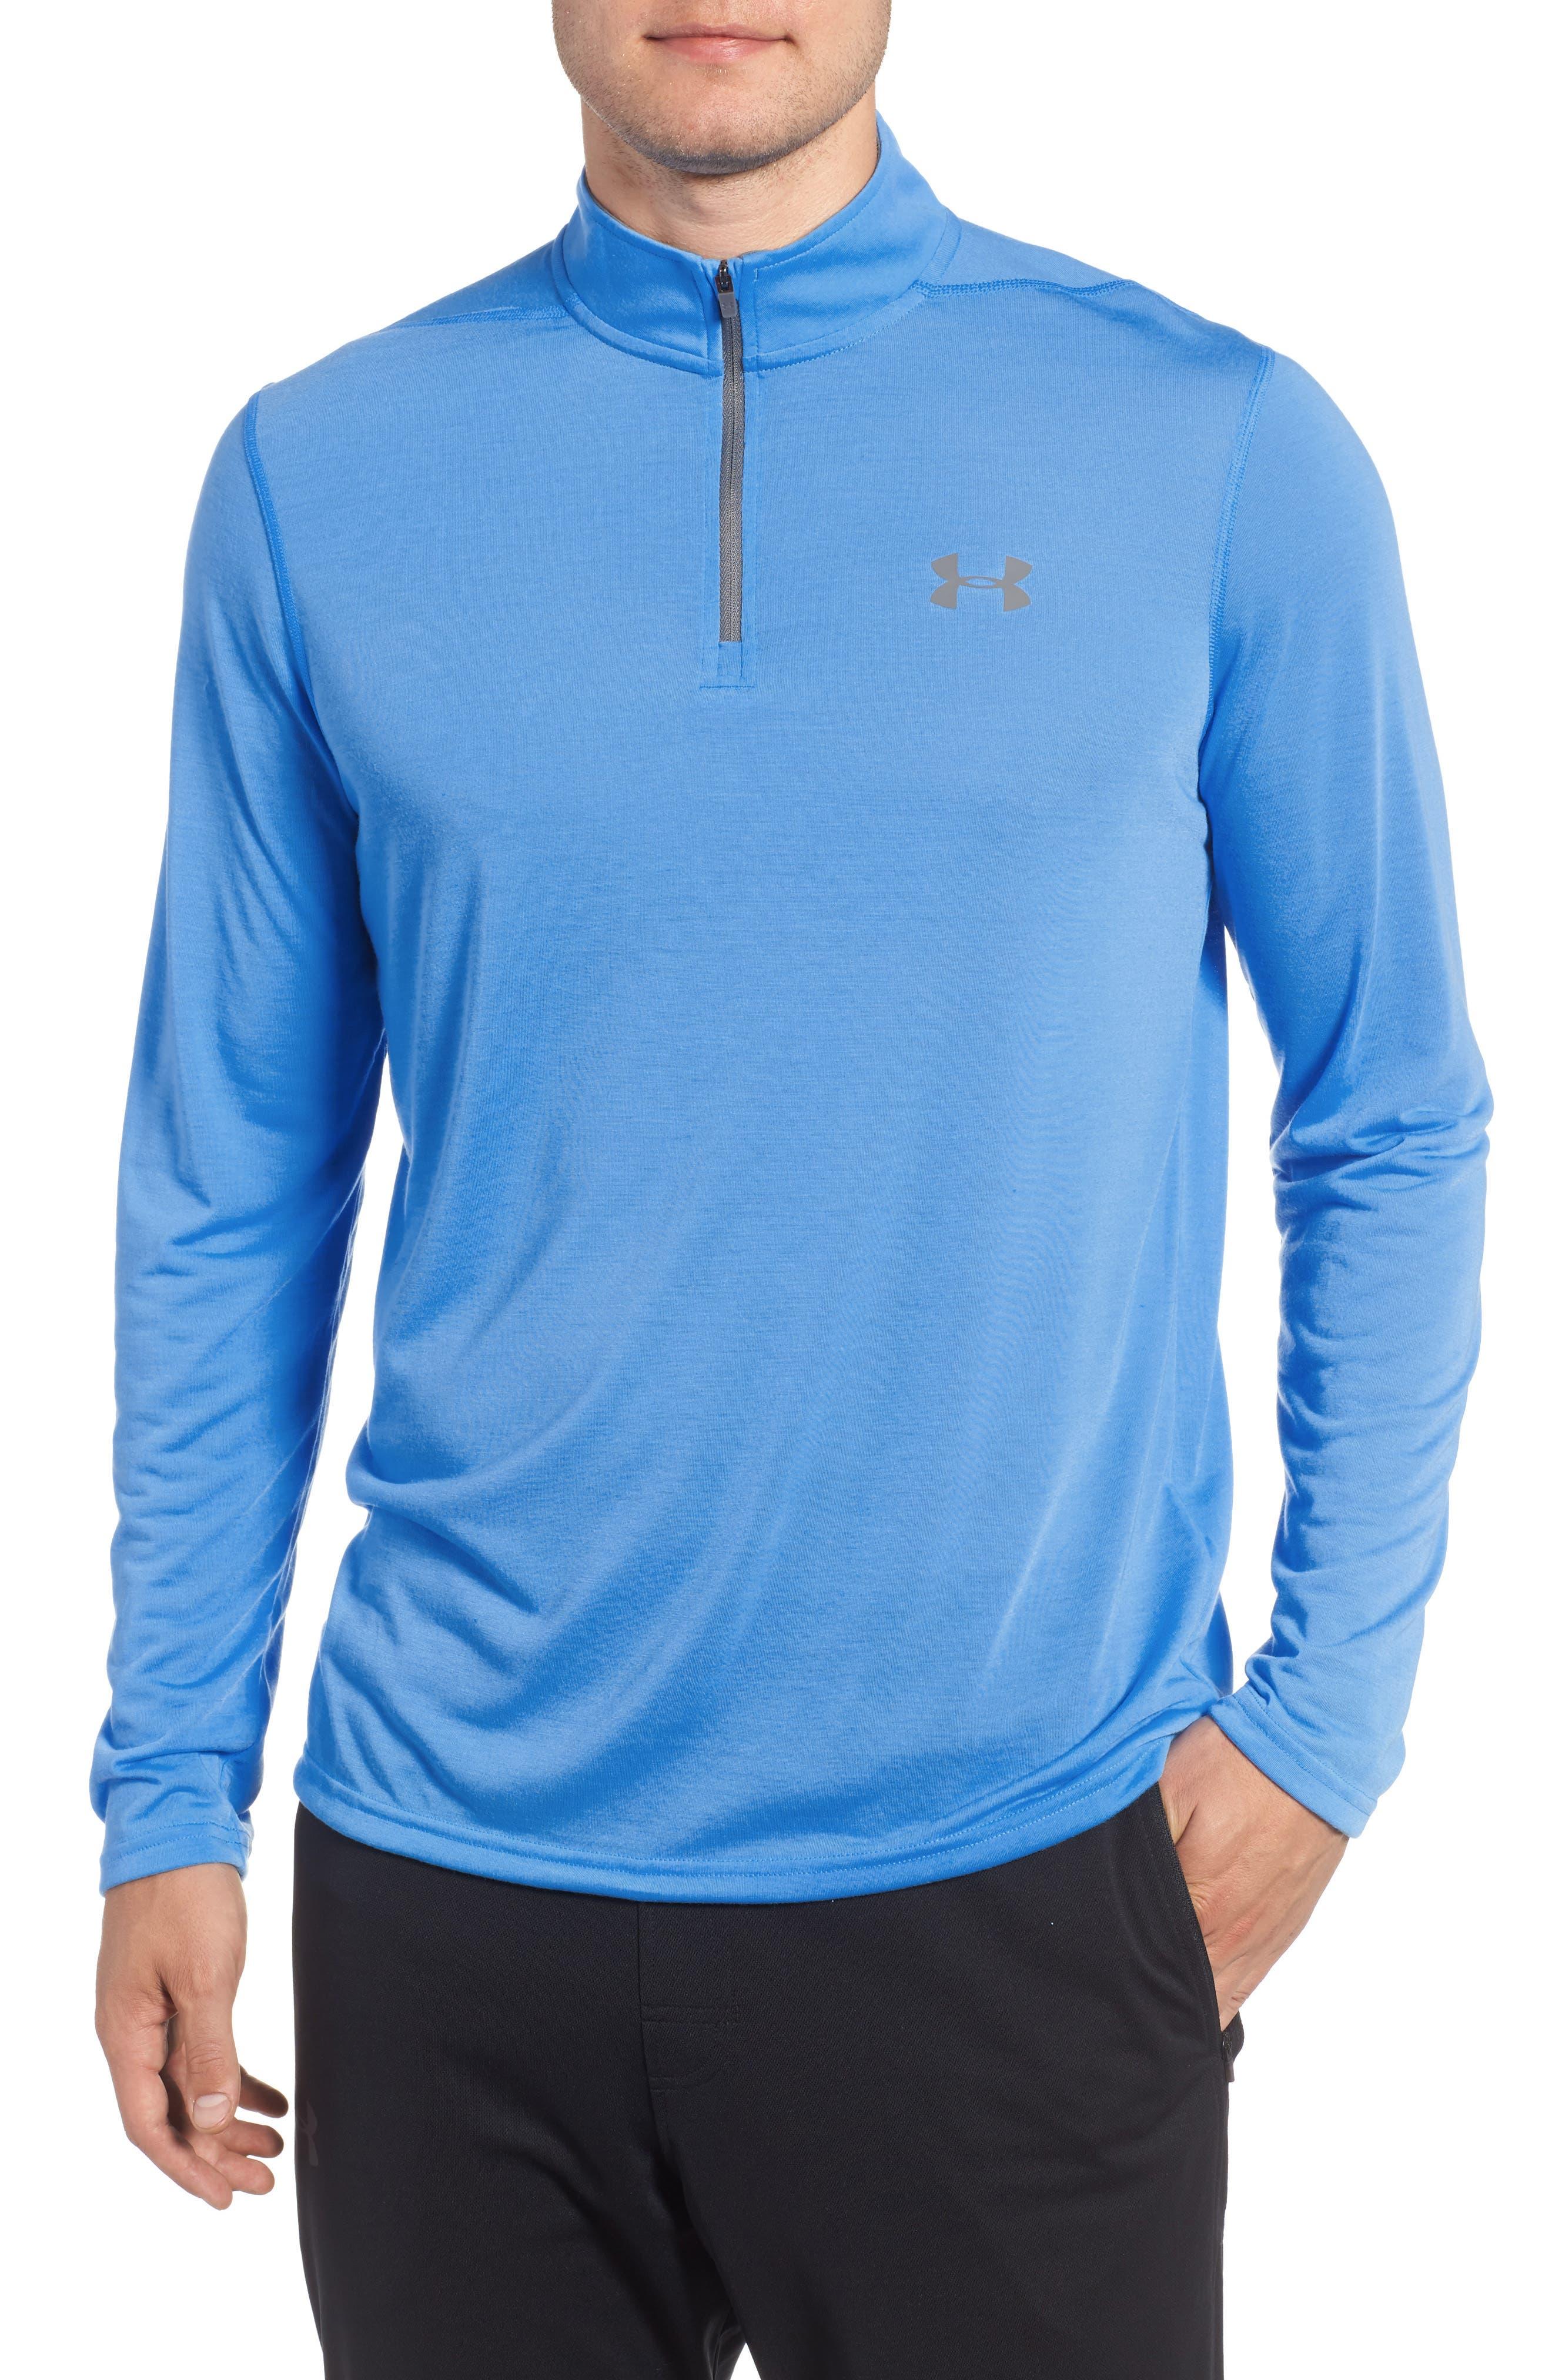 Threadborne Quarter-Zip Performance Shirt,                             Main thumbnail 1, color,                             Mako Blue / Graphite